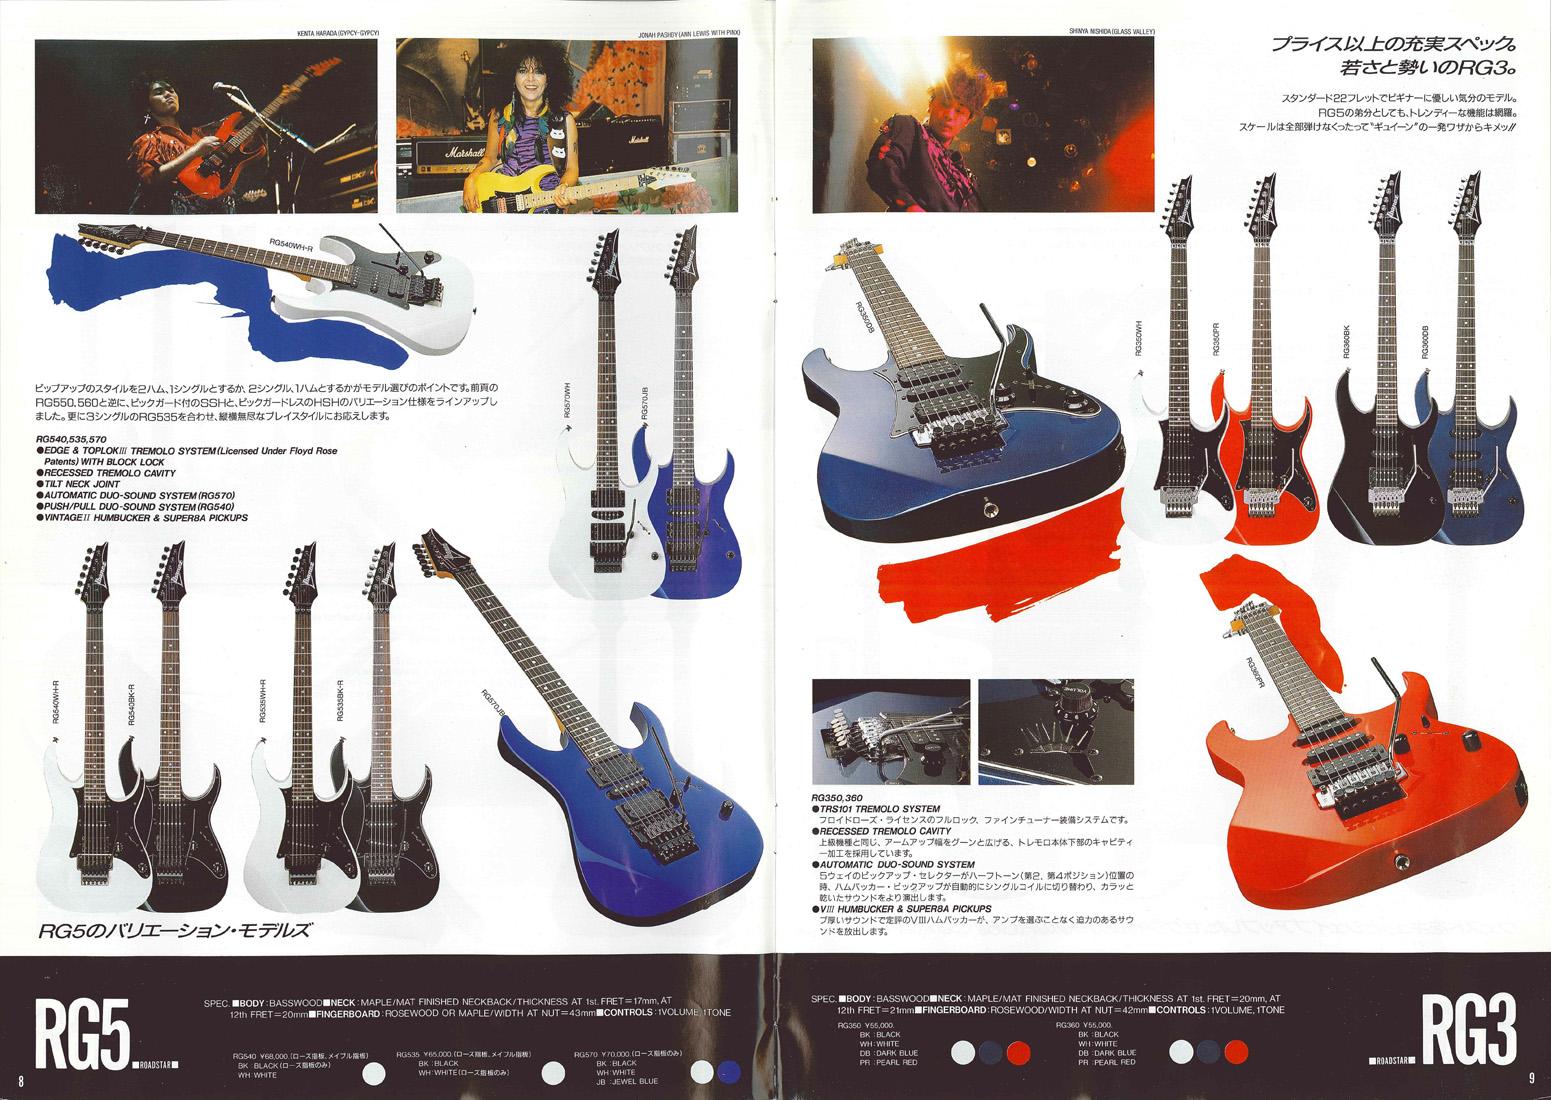 Image - 1989 Japan catalog p8-9.jpg | Ibanez Wiki | FANDOM powered ...